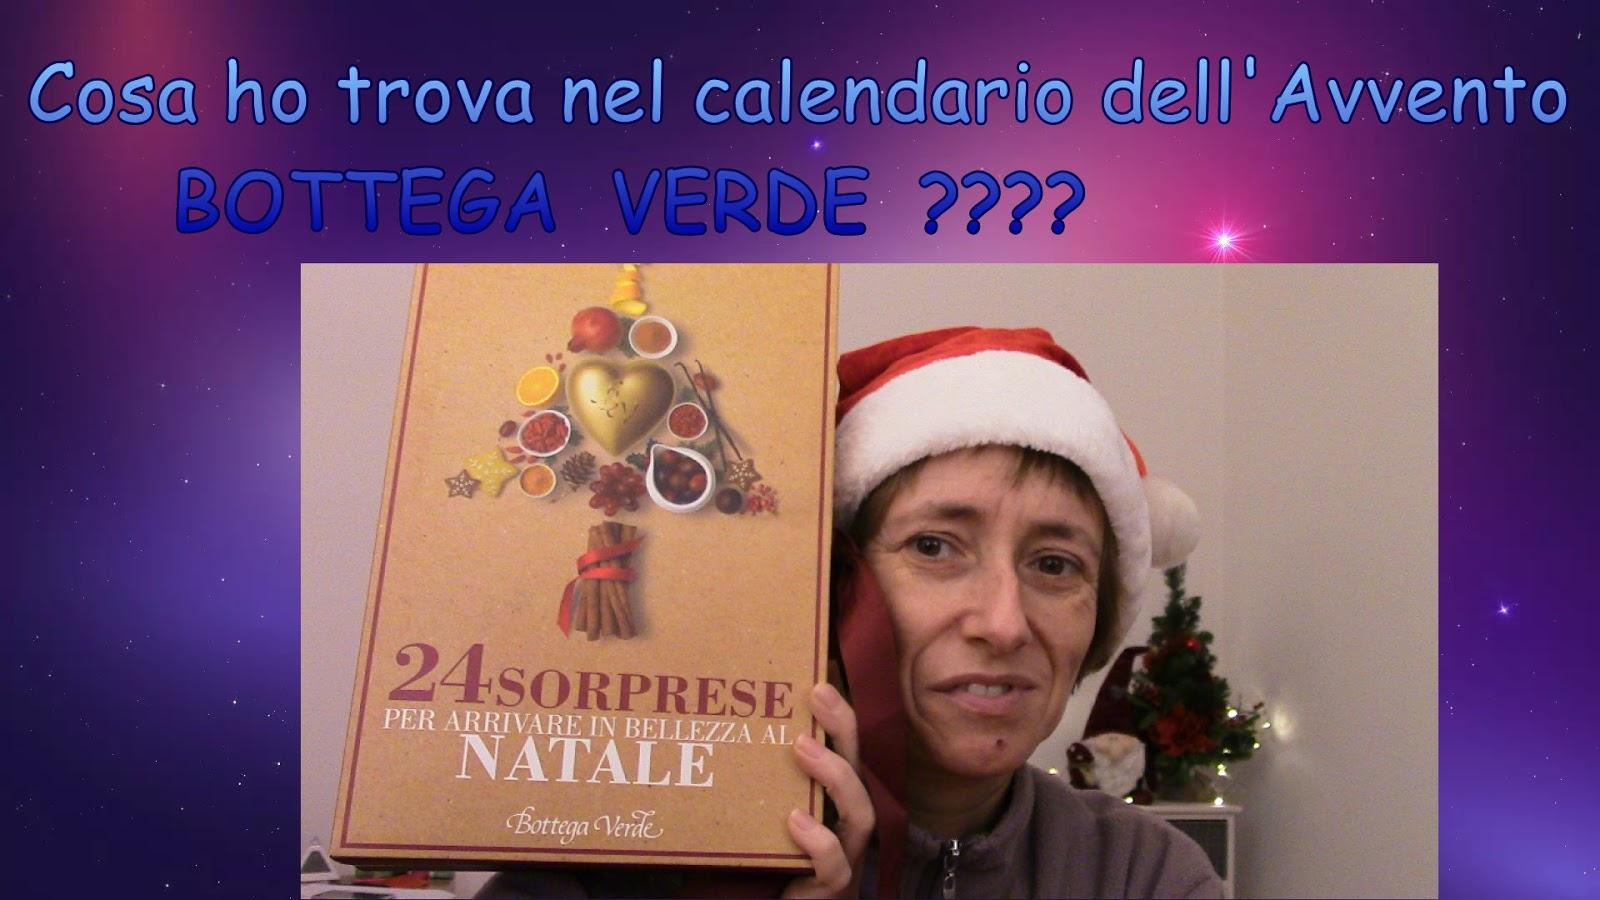 Bottega Verde Calendario Avvento.Calendario Avvento Bottega Verde Cosa Ho Trovato